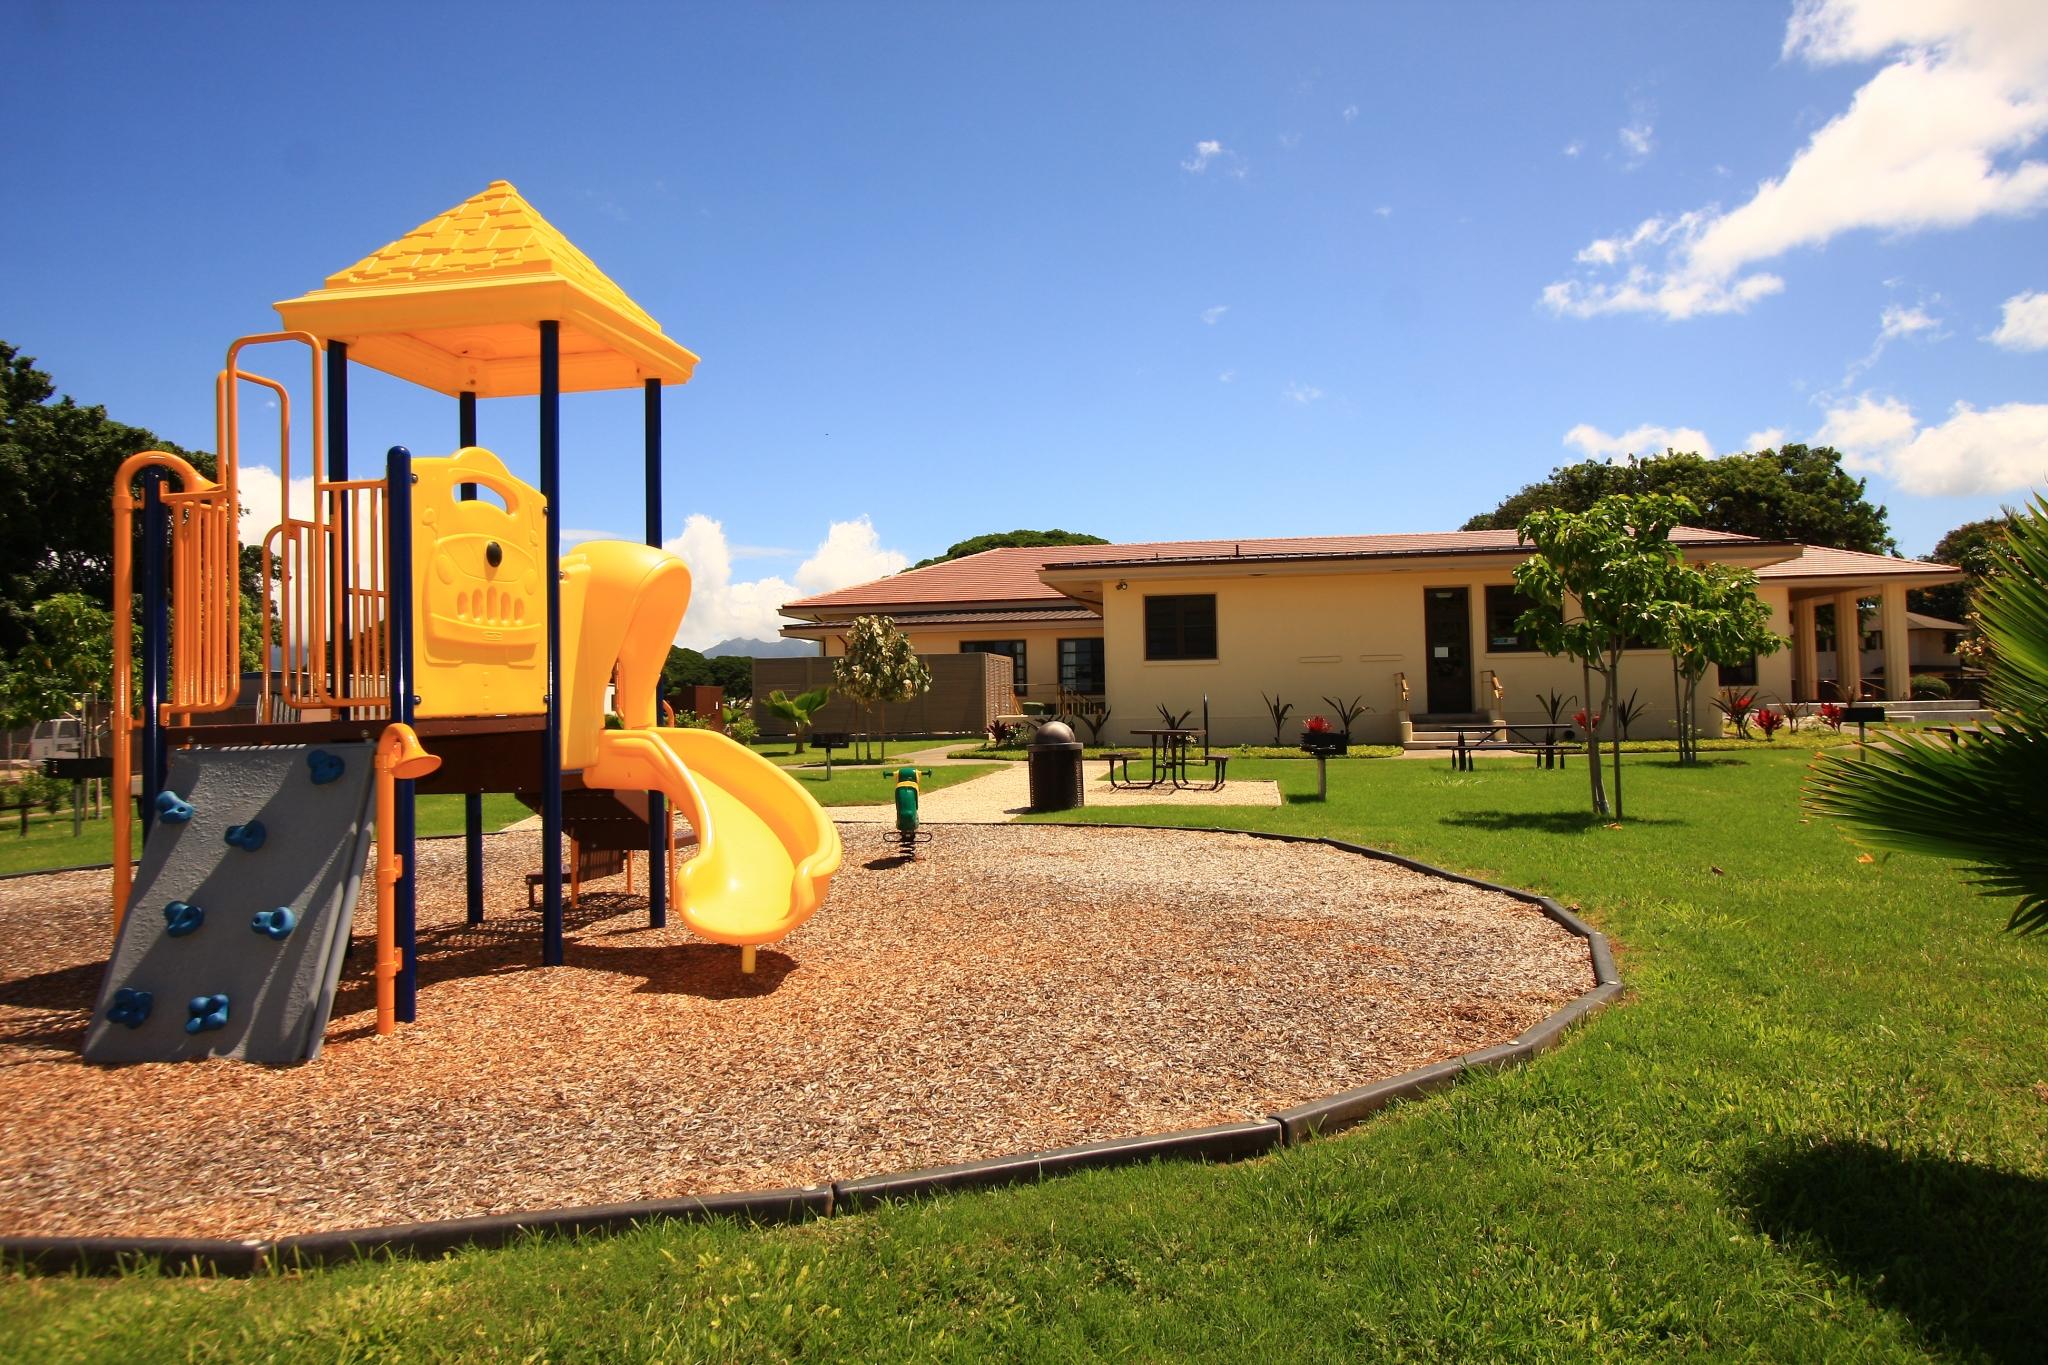 Hickam Communities | Community Center | Playground |